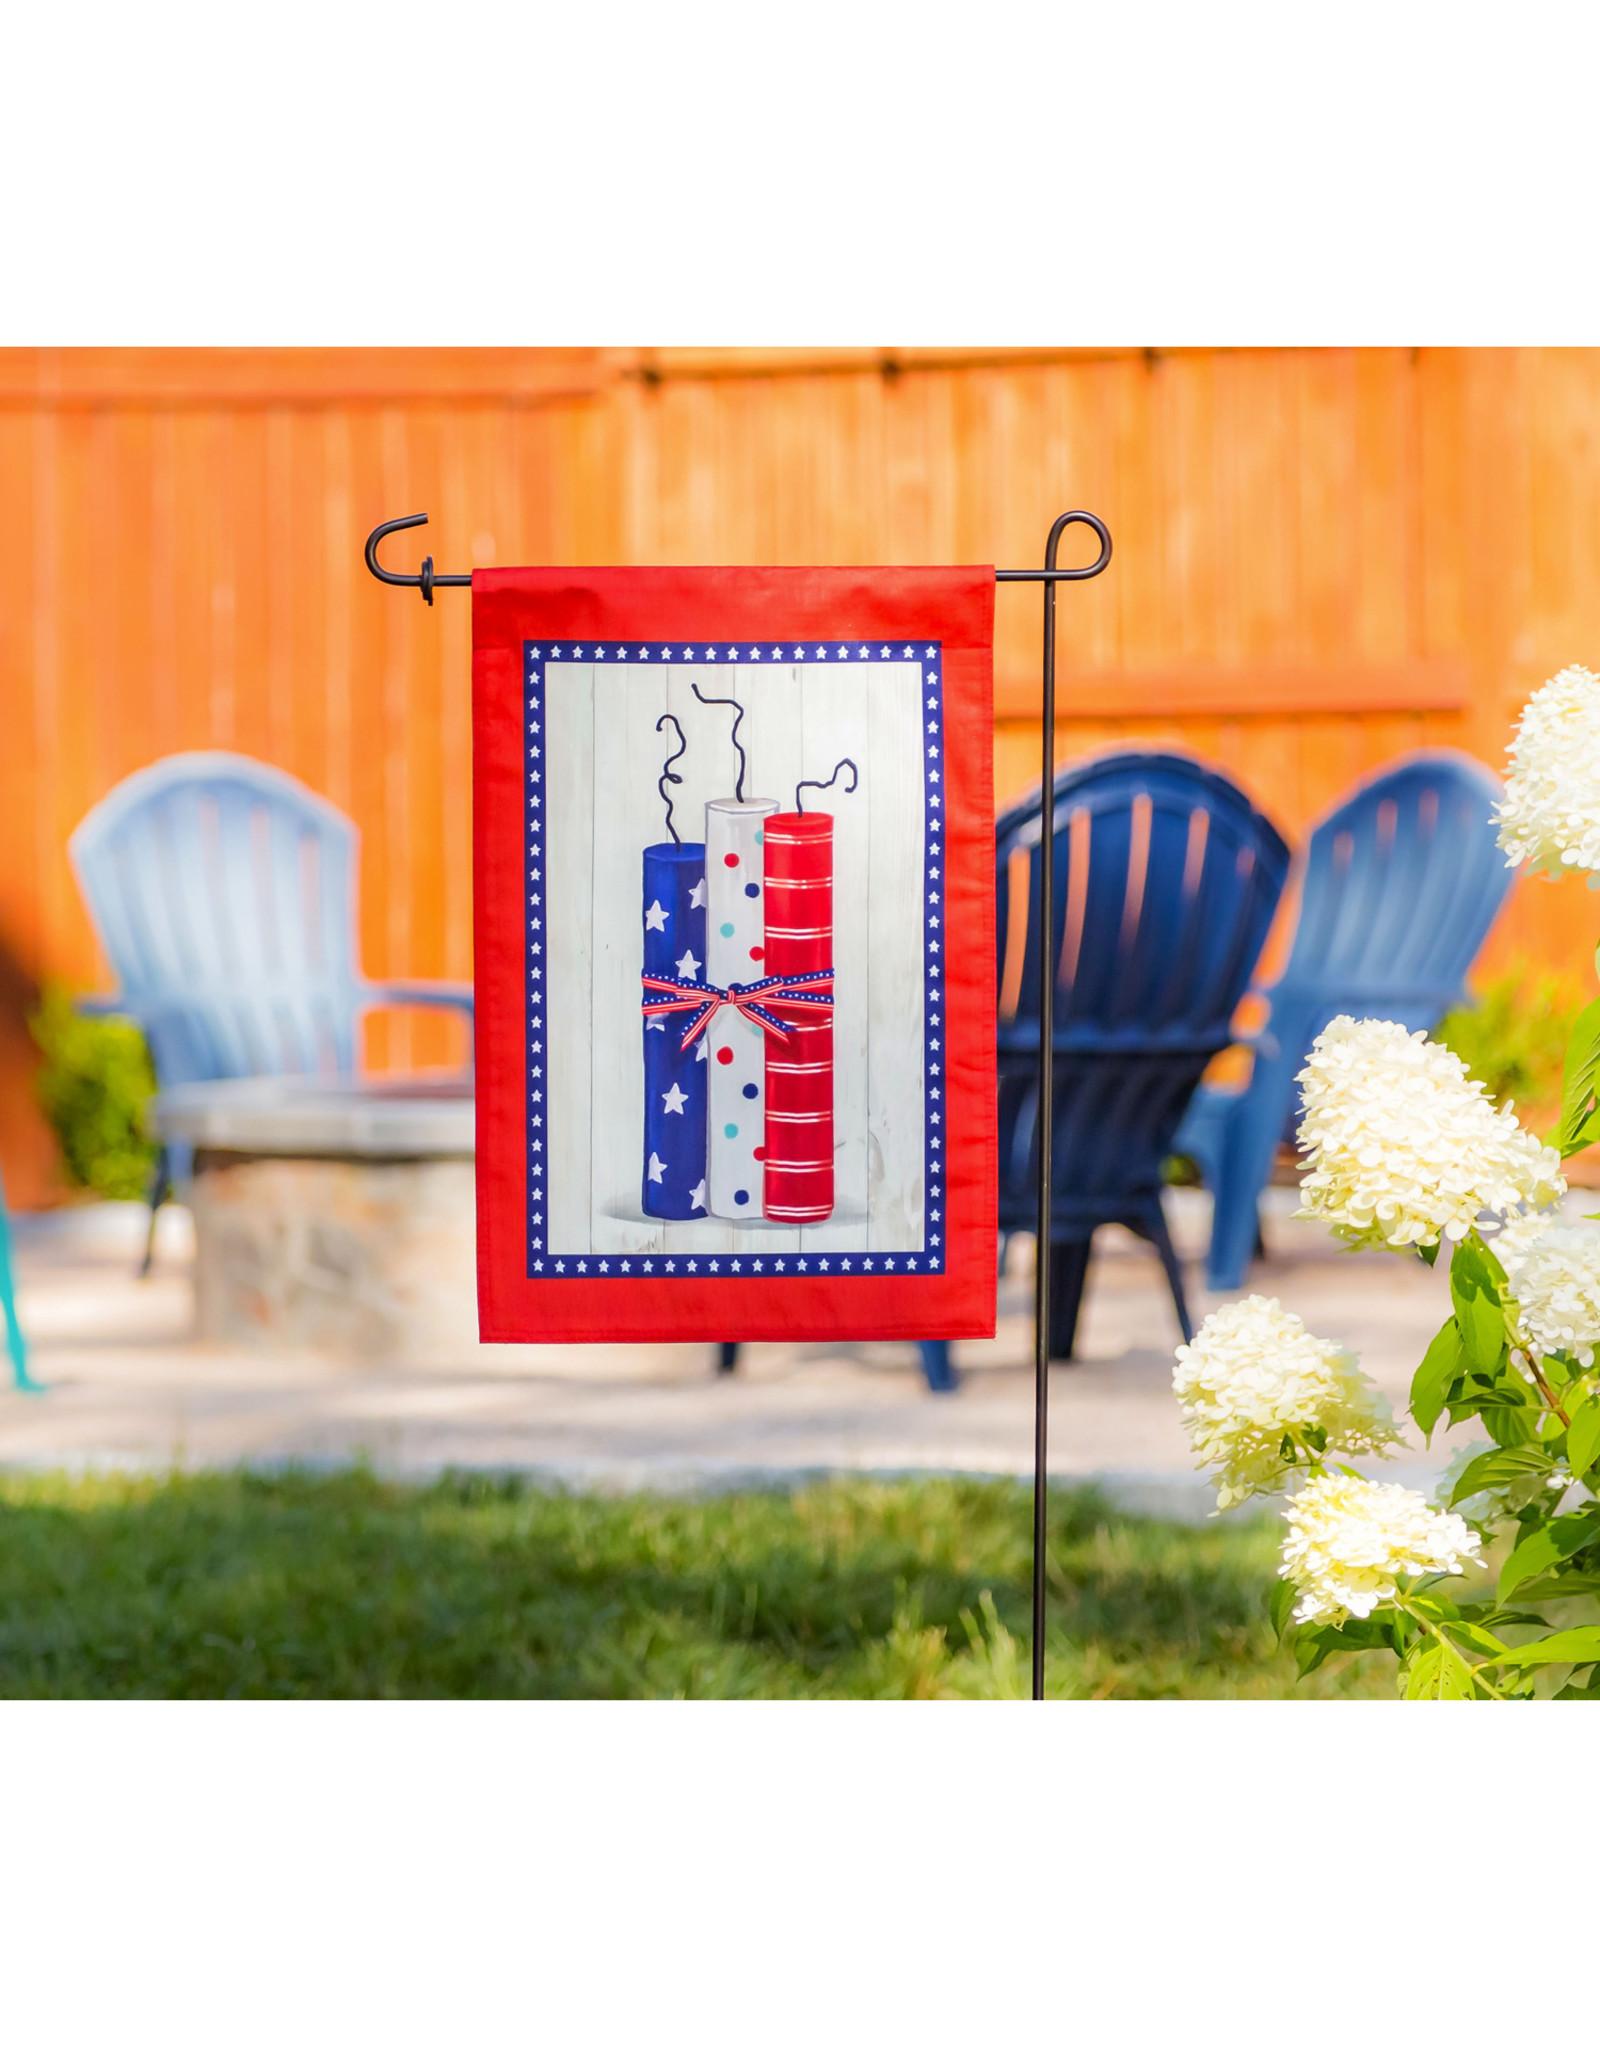 Evergreen Enterprises Americana Firecrackers Garden Strié Flag